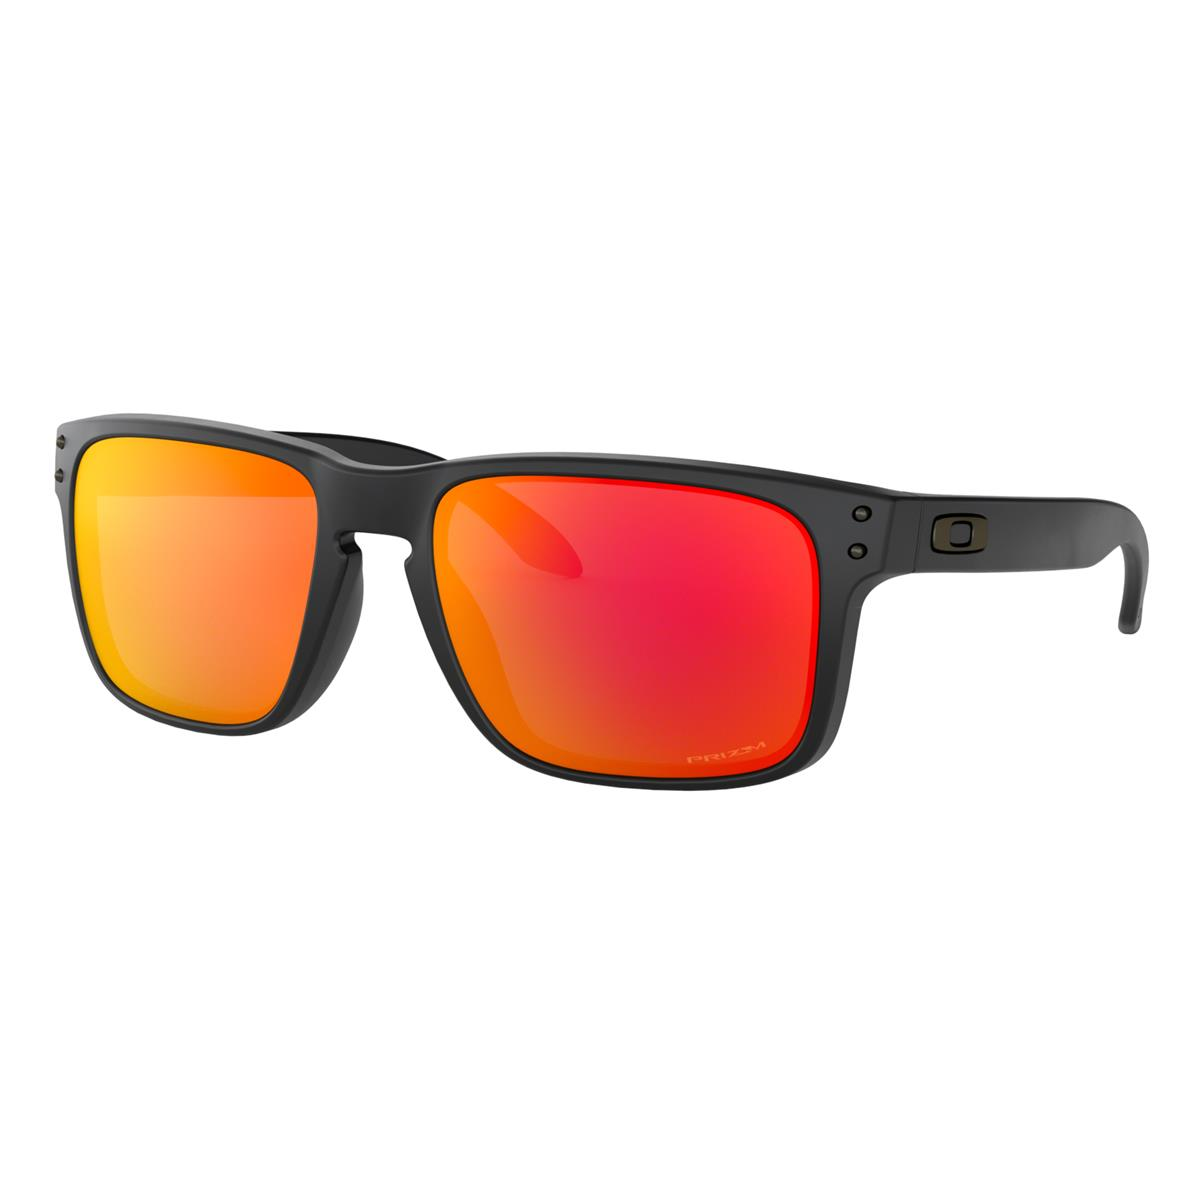 Oakley Sonnenbrille Holbrook Matt Schwarz - Prizm Ruby